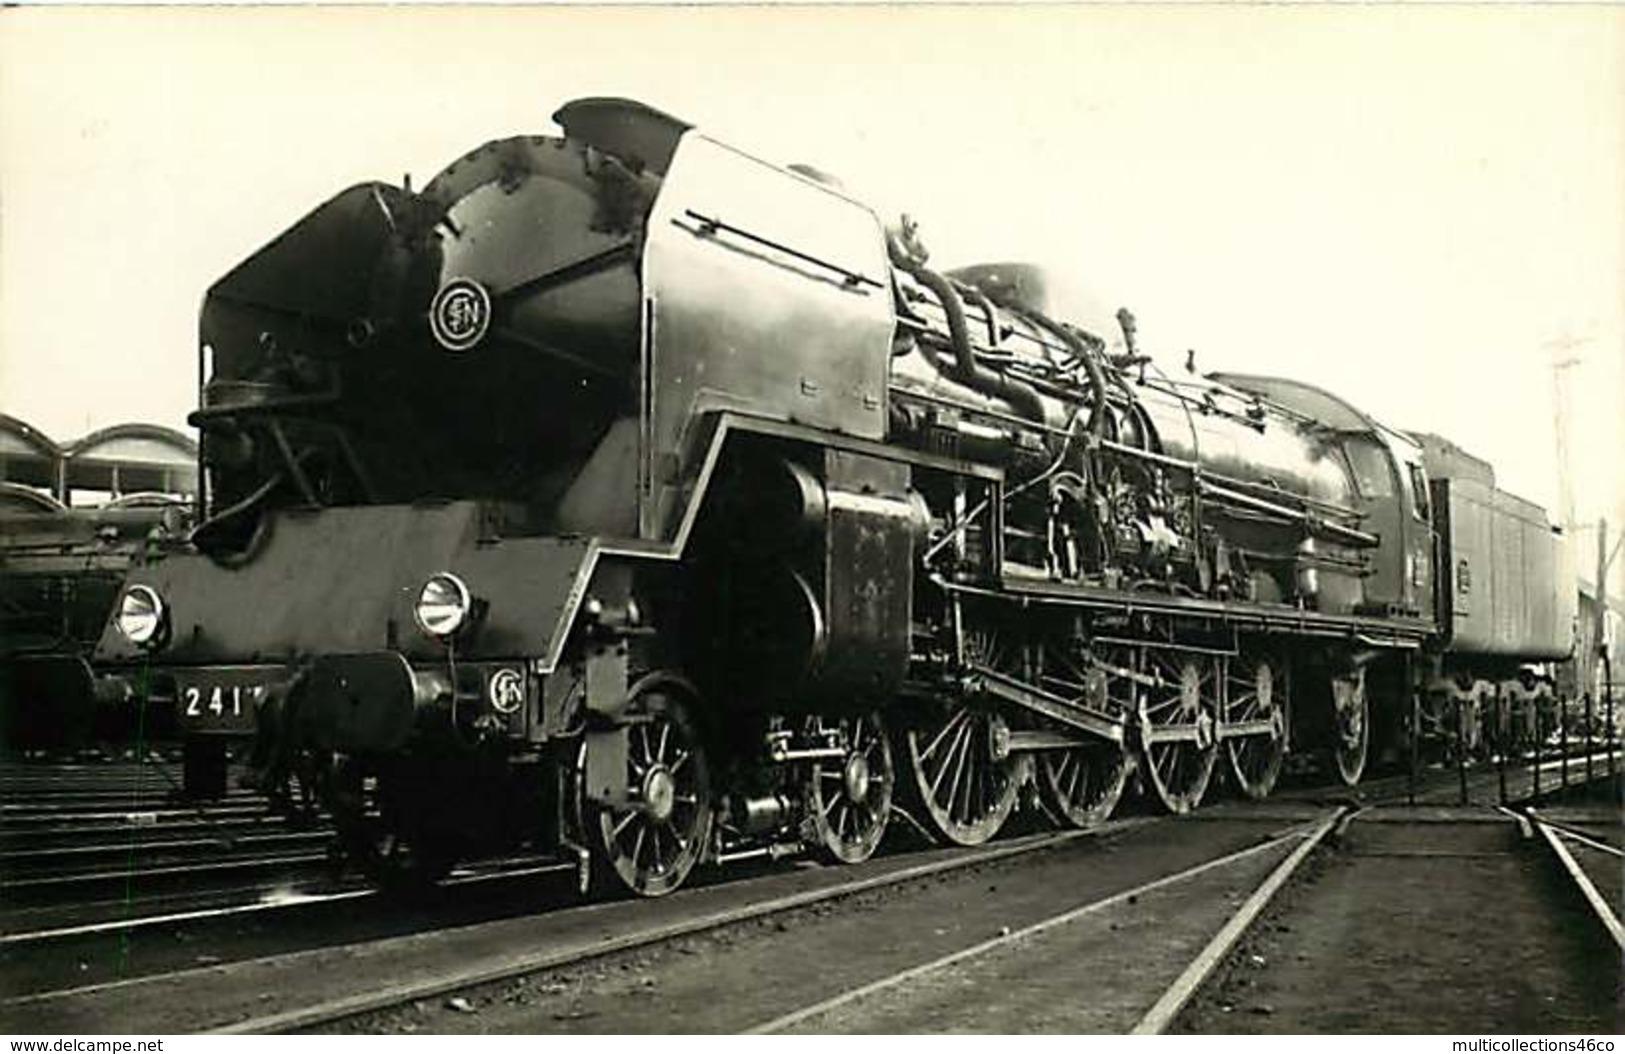 100519B TRANSPORT TRAIN CHEMIN DE FER - PHOTO VILAIN - Locomotive SNCF 241P4 BERCY PARIS - Estaciones Con Trenes